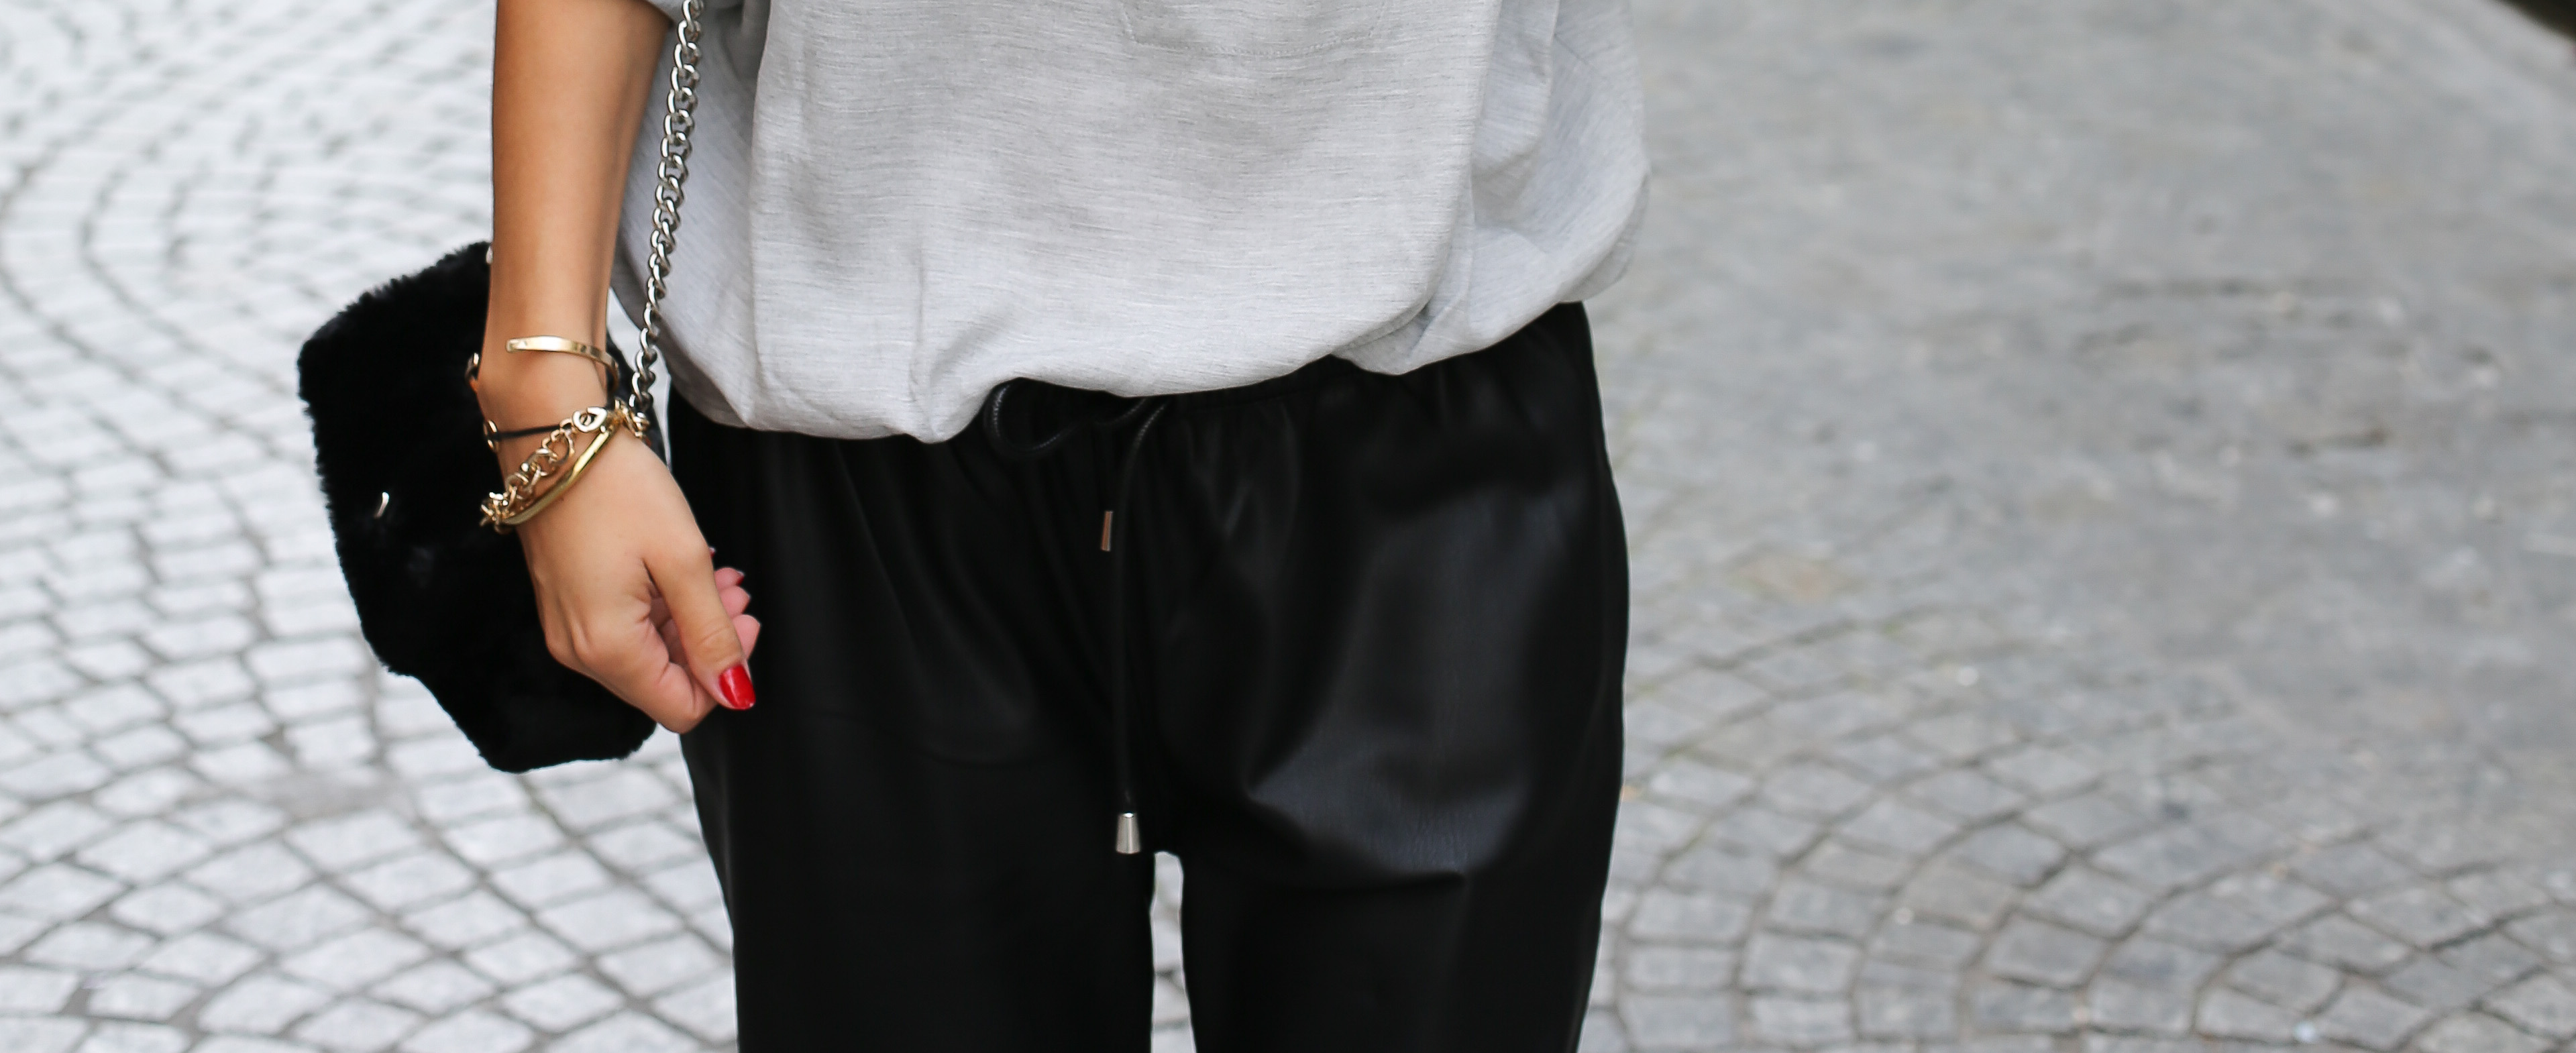 blog-mode-paris-pantalon-cuir7